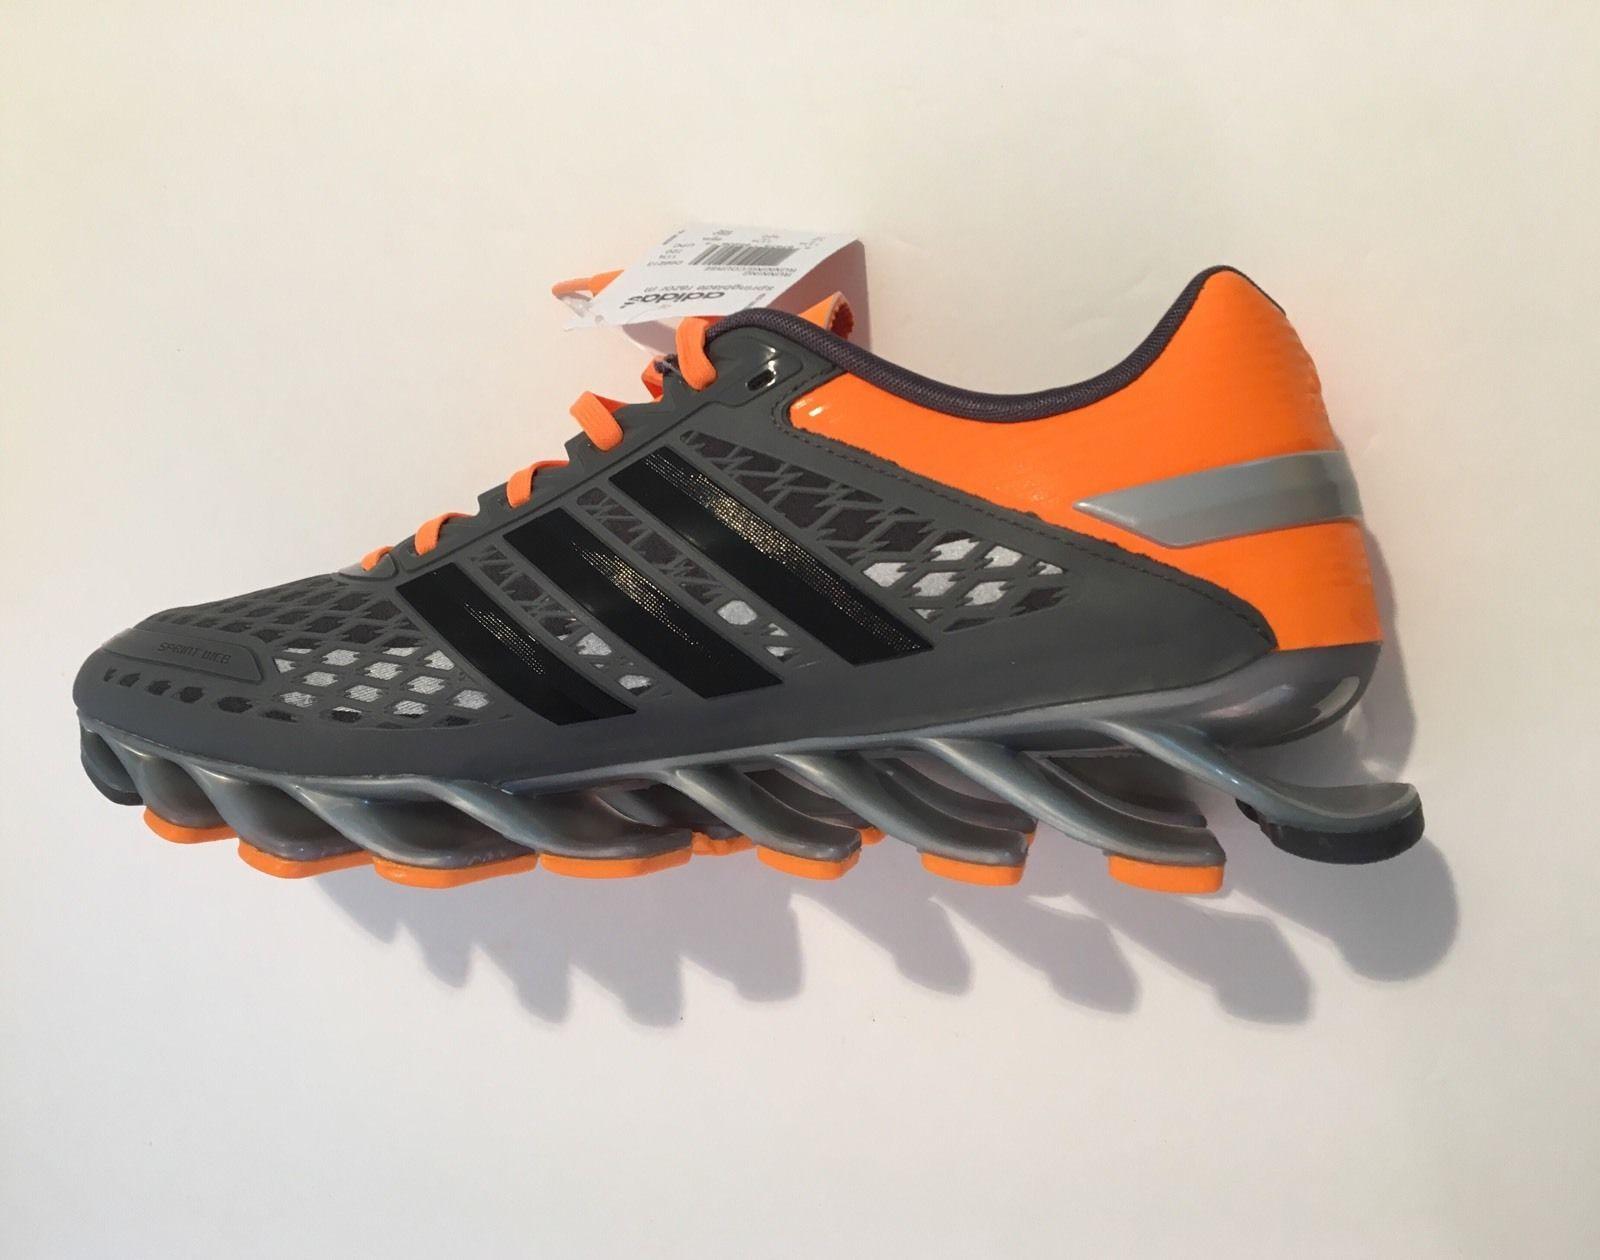 online store 7e778 4824a  180 Mens Adidas Springblade Razor Running and 25 similar items. 57